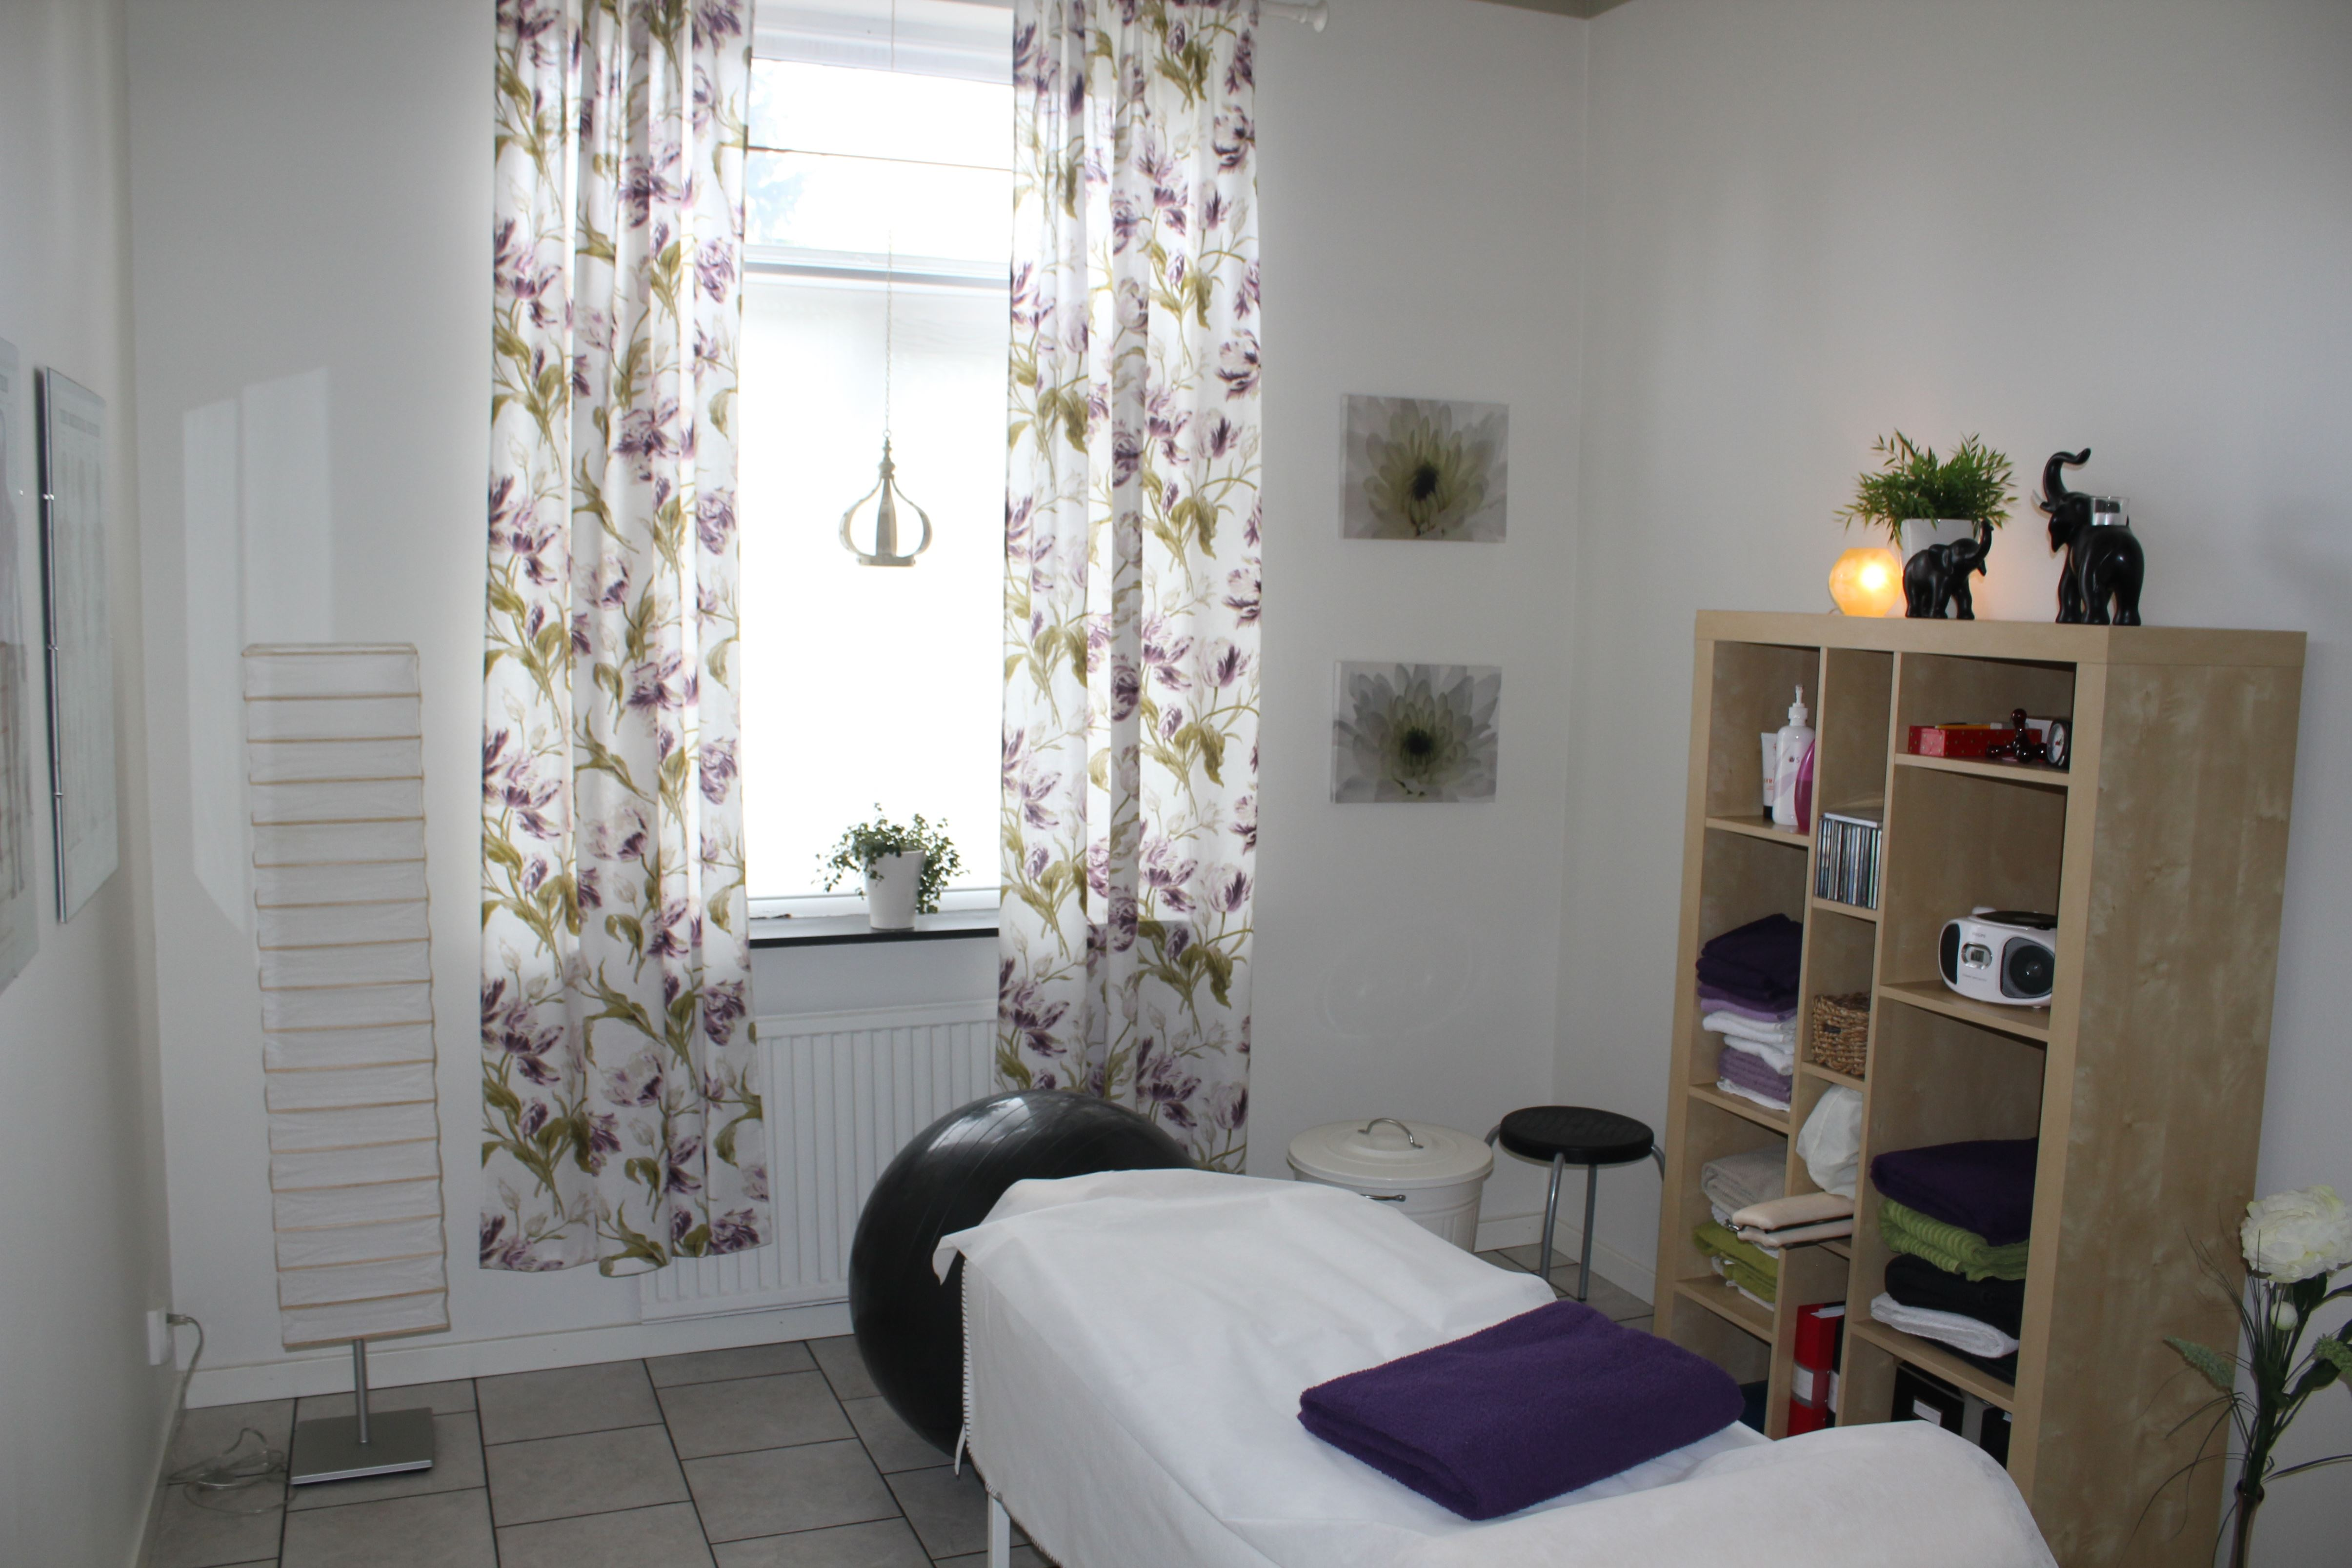 Kerstins Massage & Friskvård